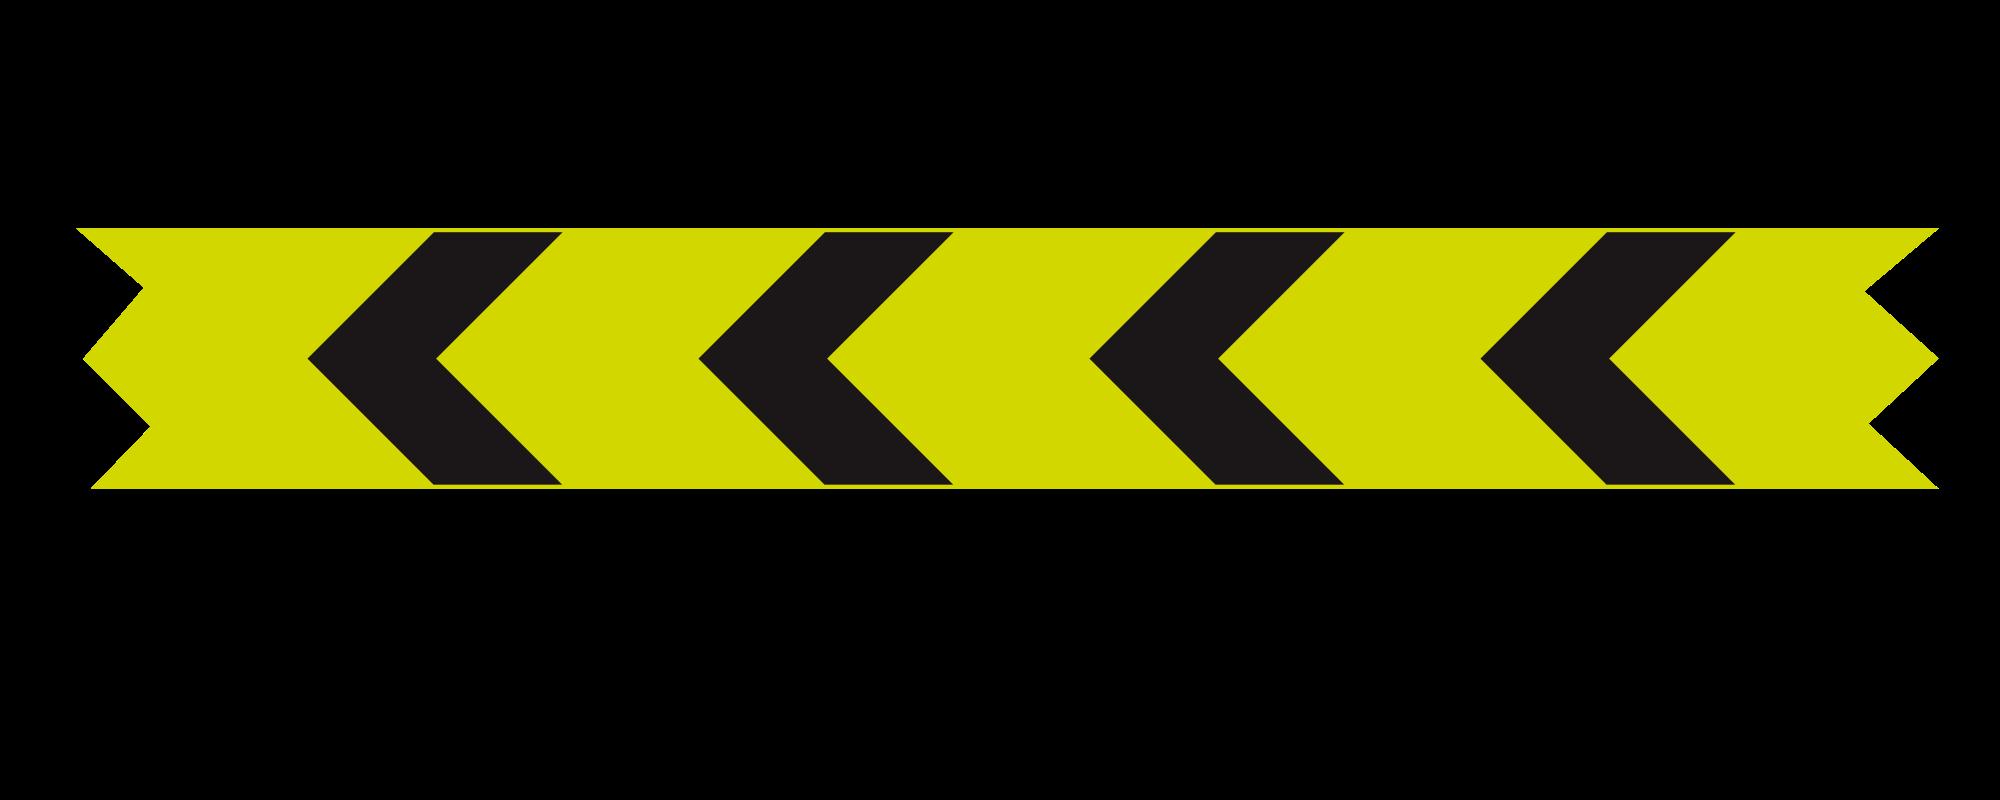 2000px-Singapore_Road_Signs_-_Warning_Sign_-_Sharp_Deviation_4.svg